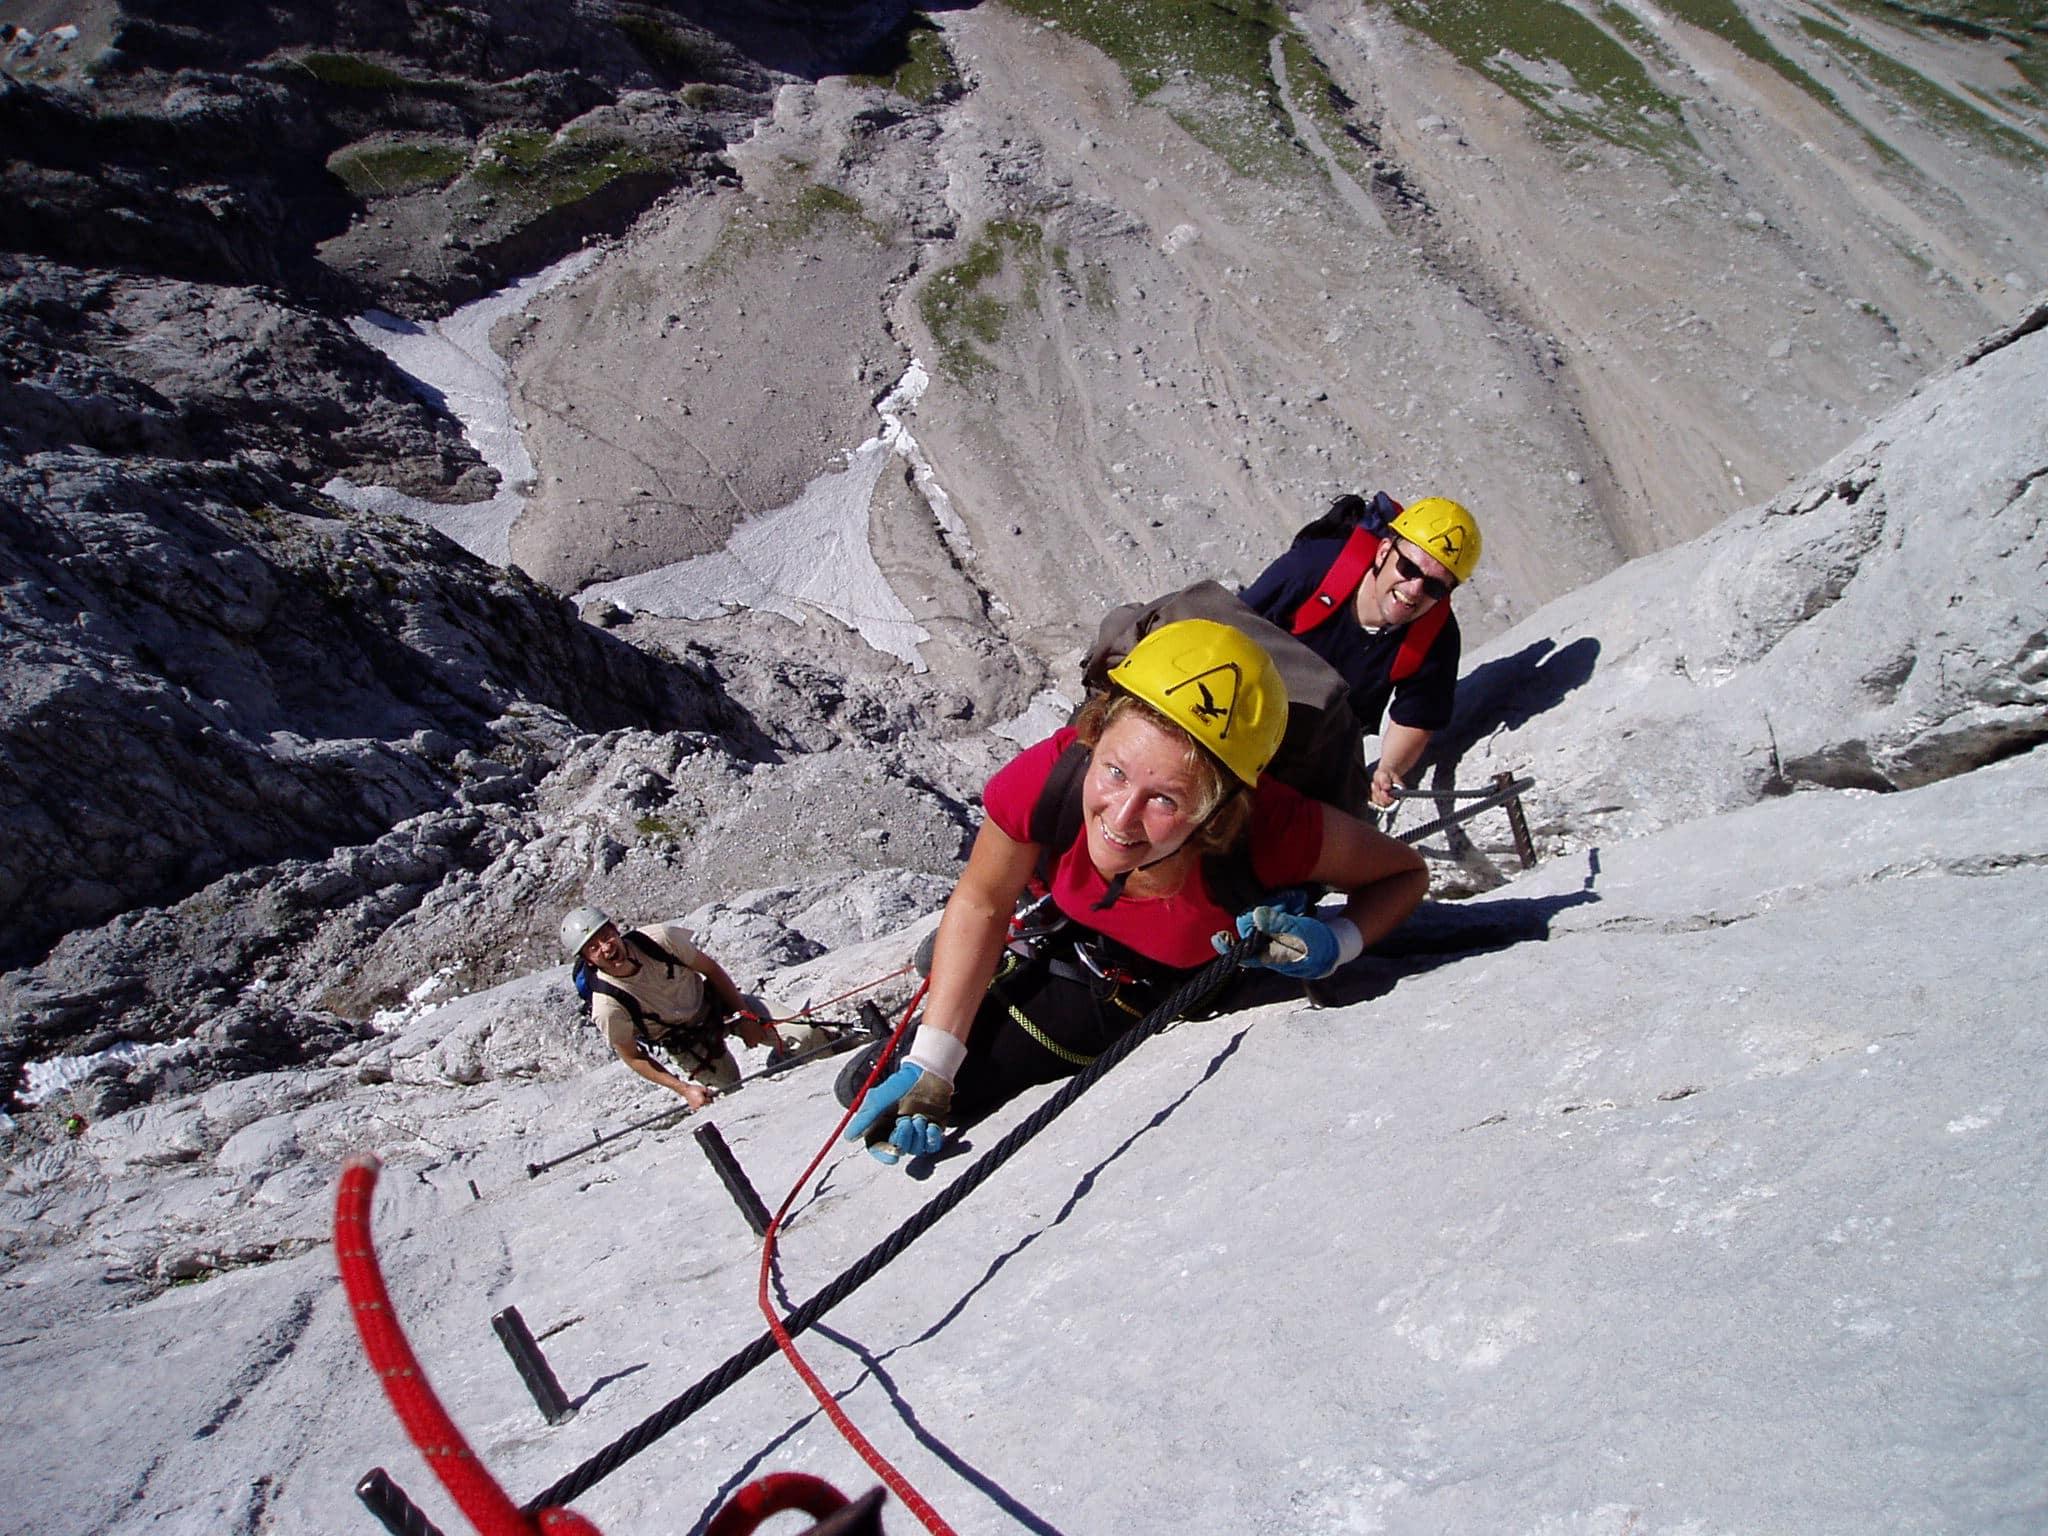 Klettersteig Johann Topo : Klettersteig basiskurs bergführer dachstein